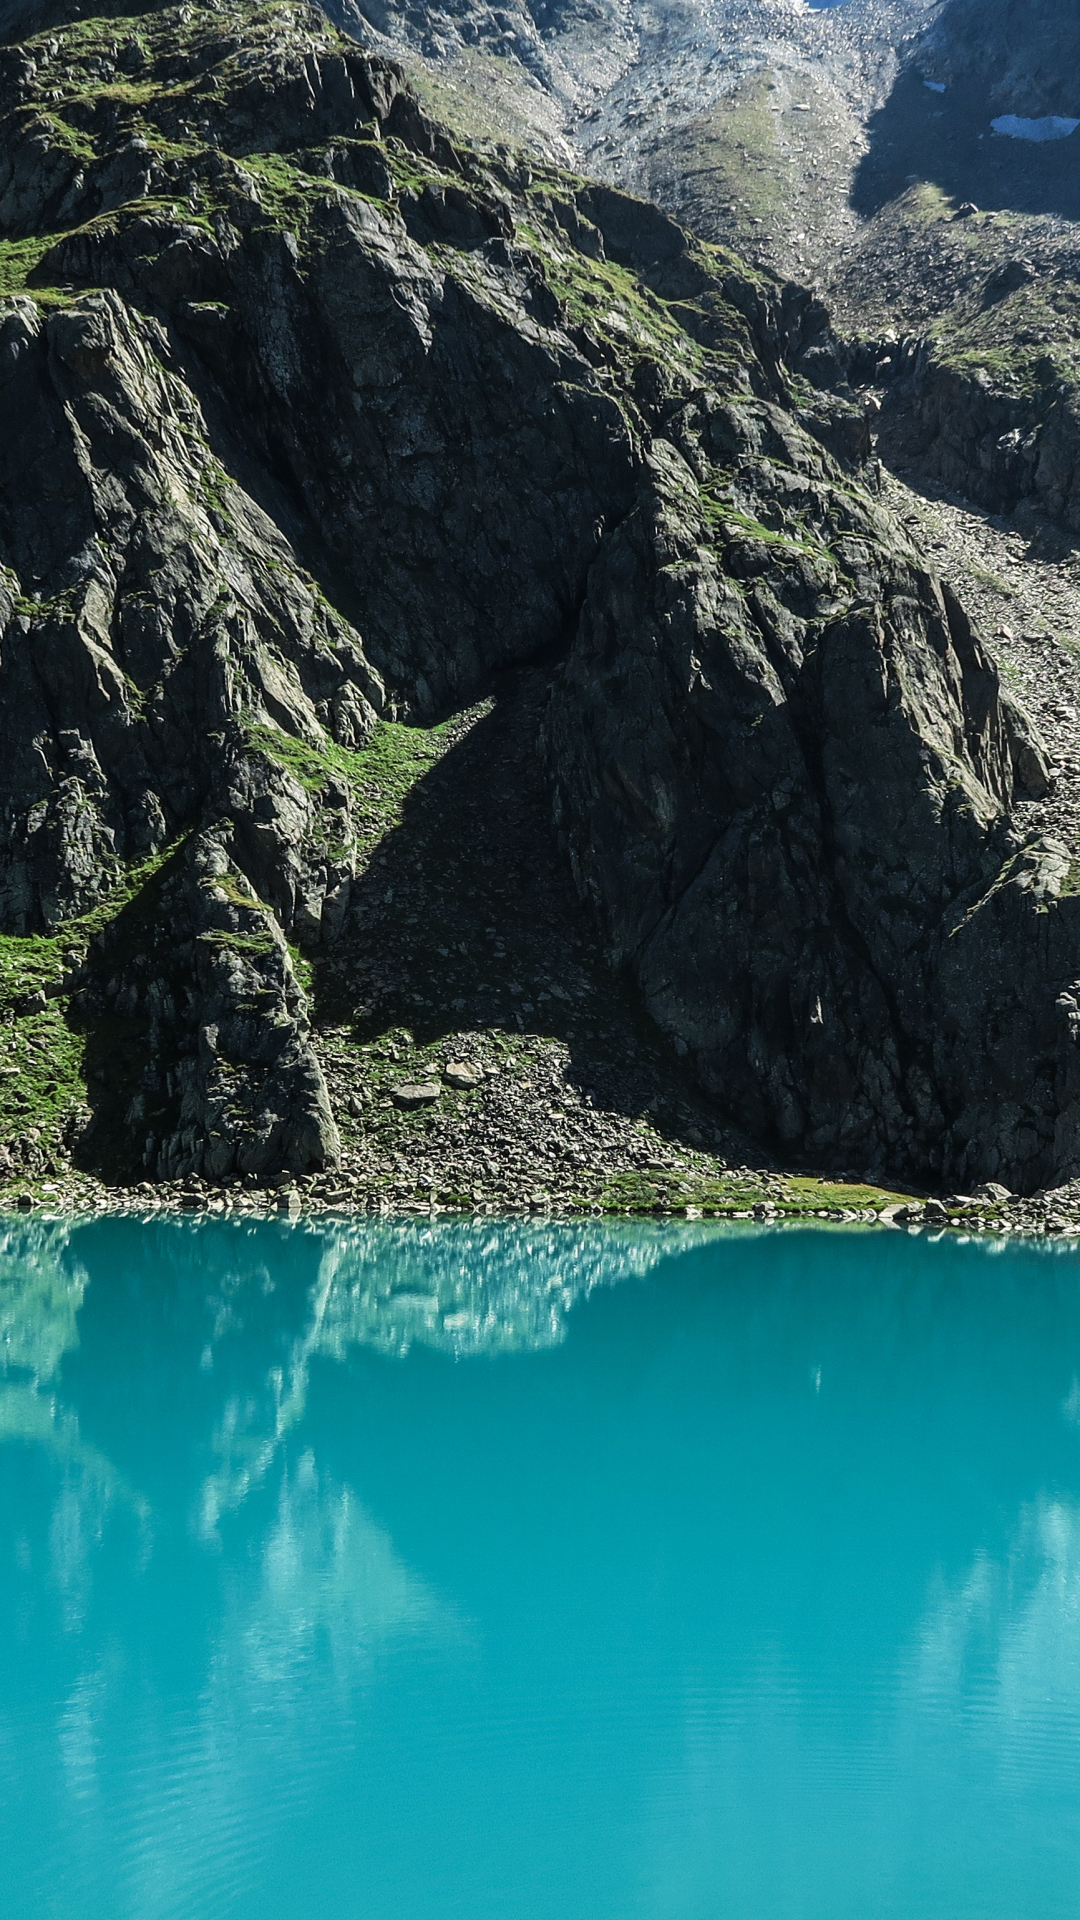 Water, Mountain, Rock iPhone Wallpaper